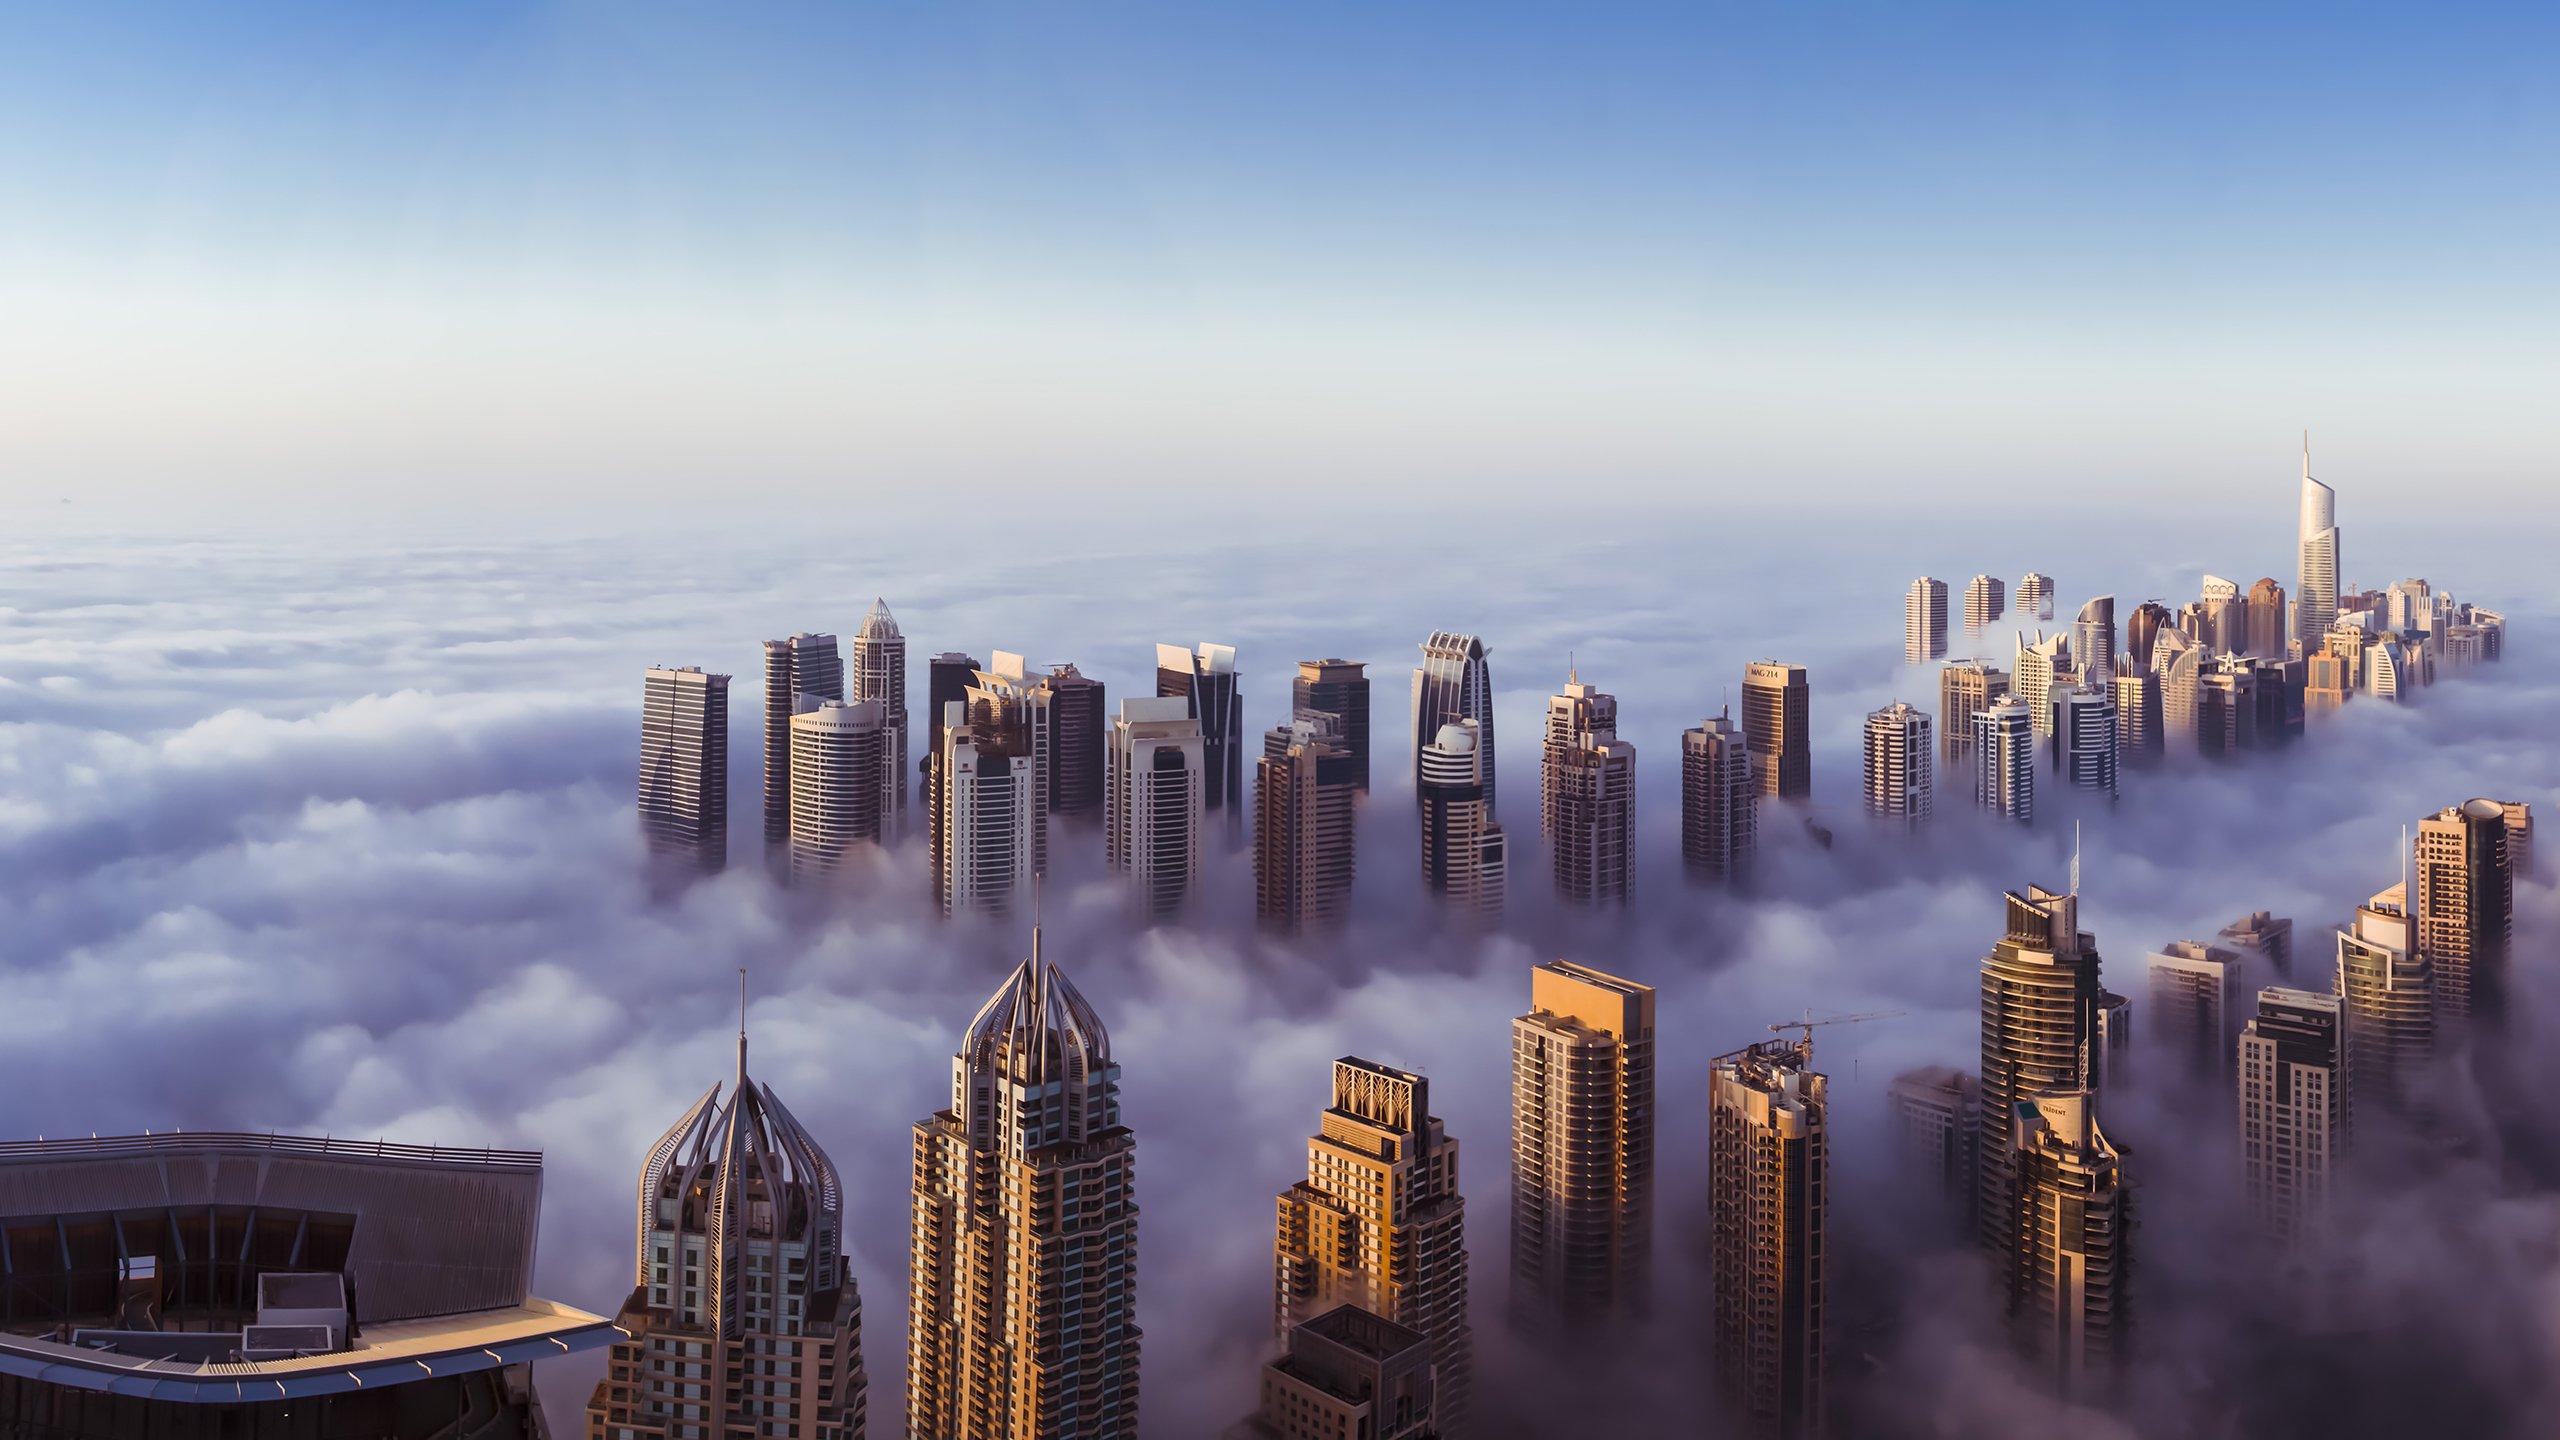 Buildings Skyscrapers Fog Mist Wallpaper 2560x1440